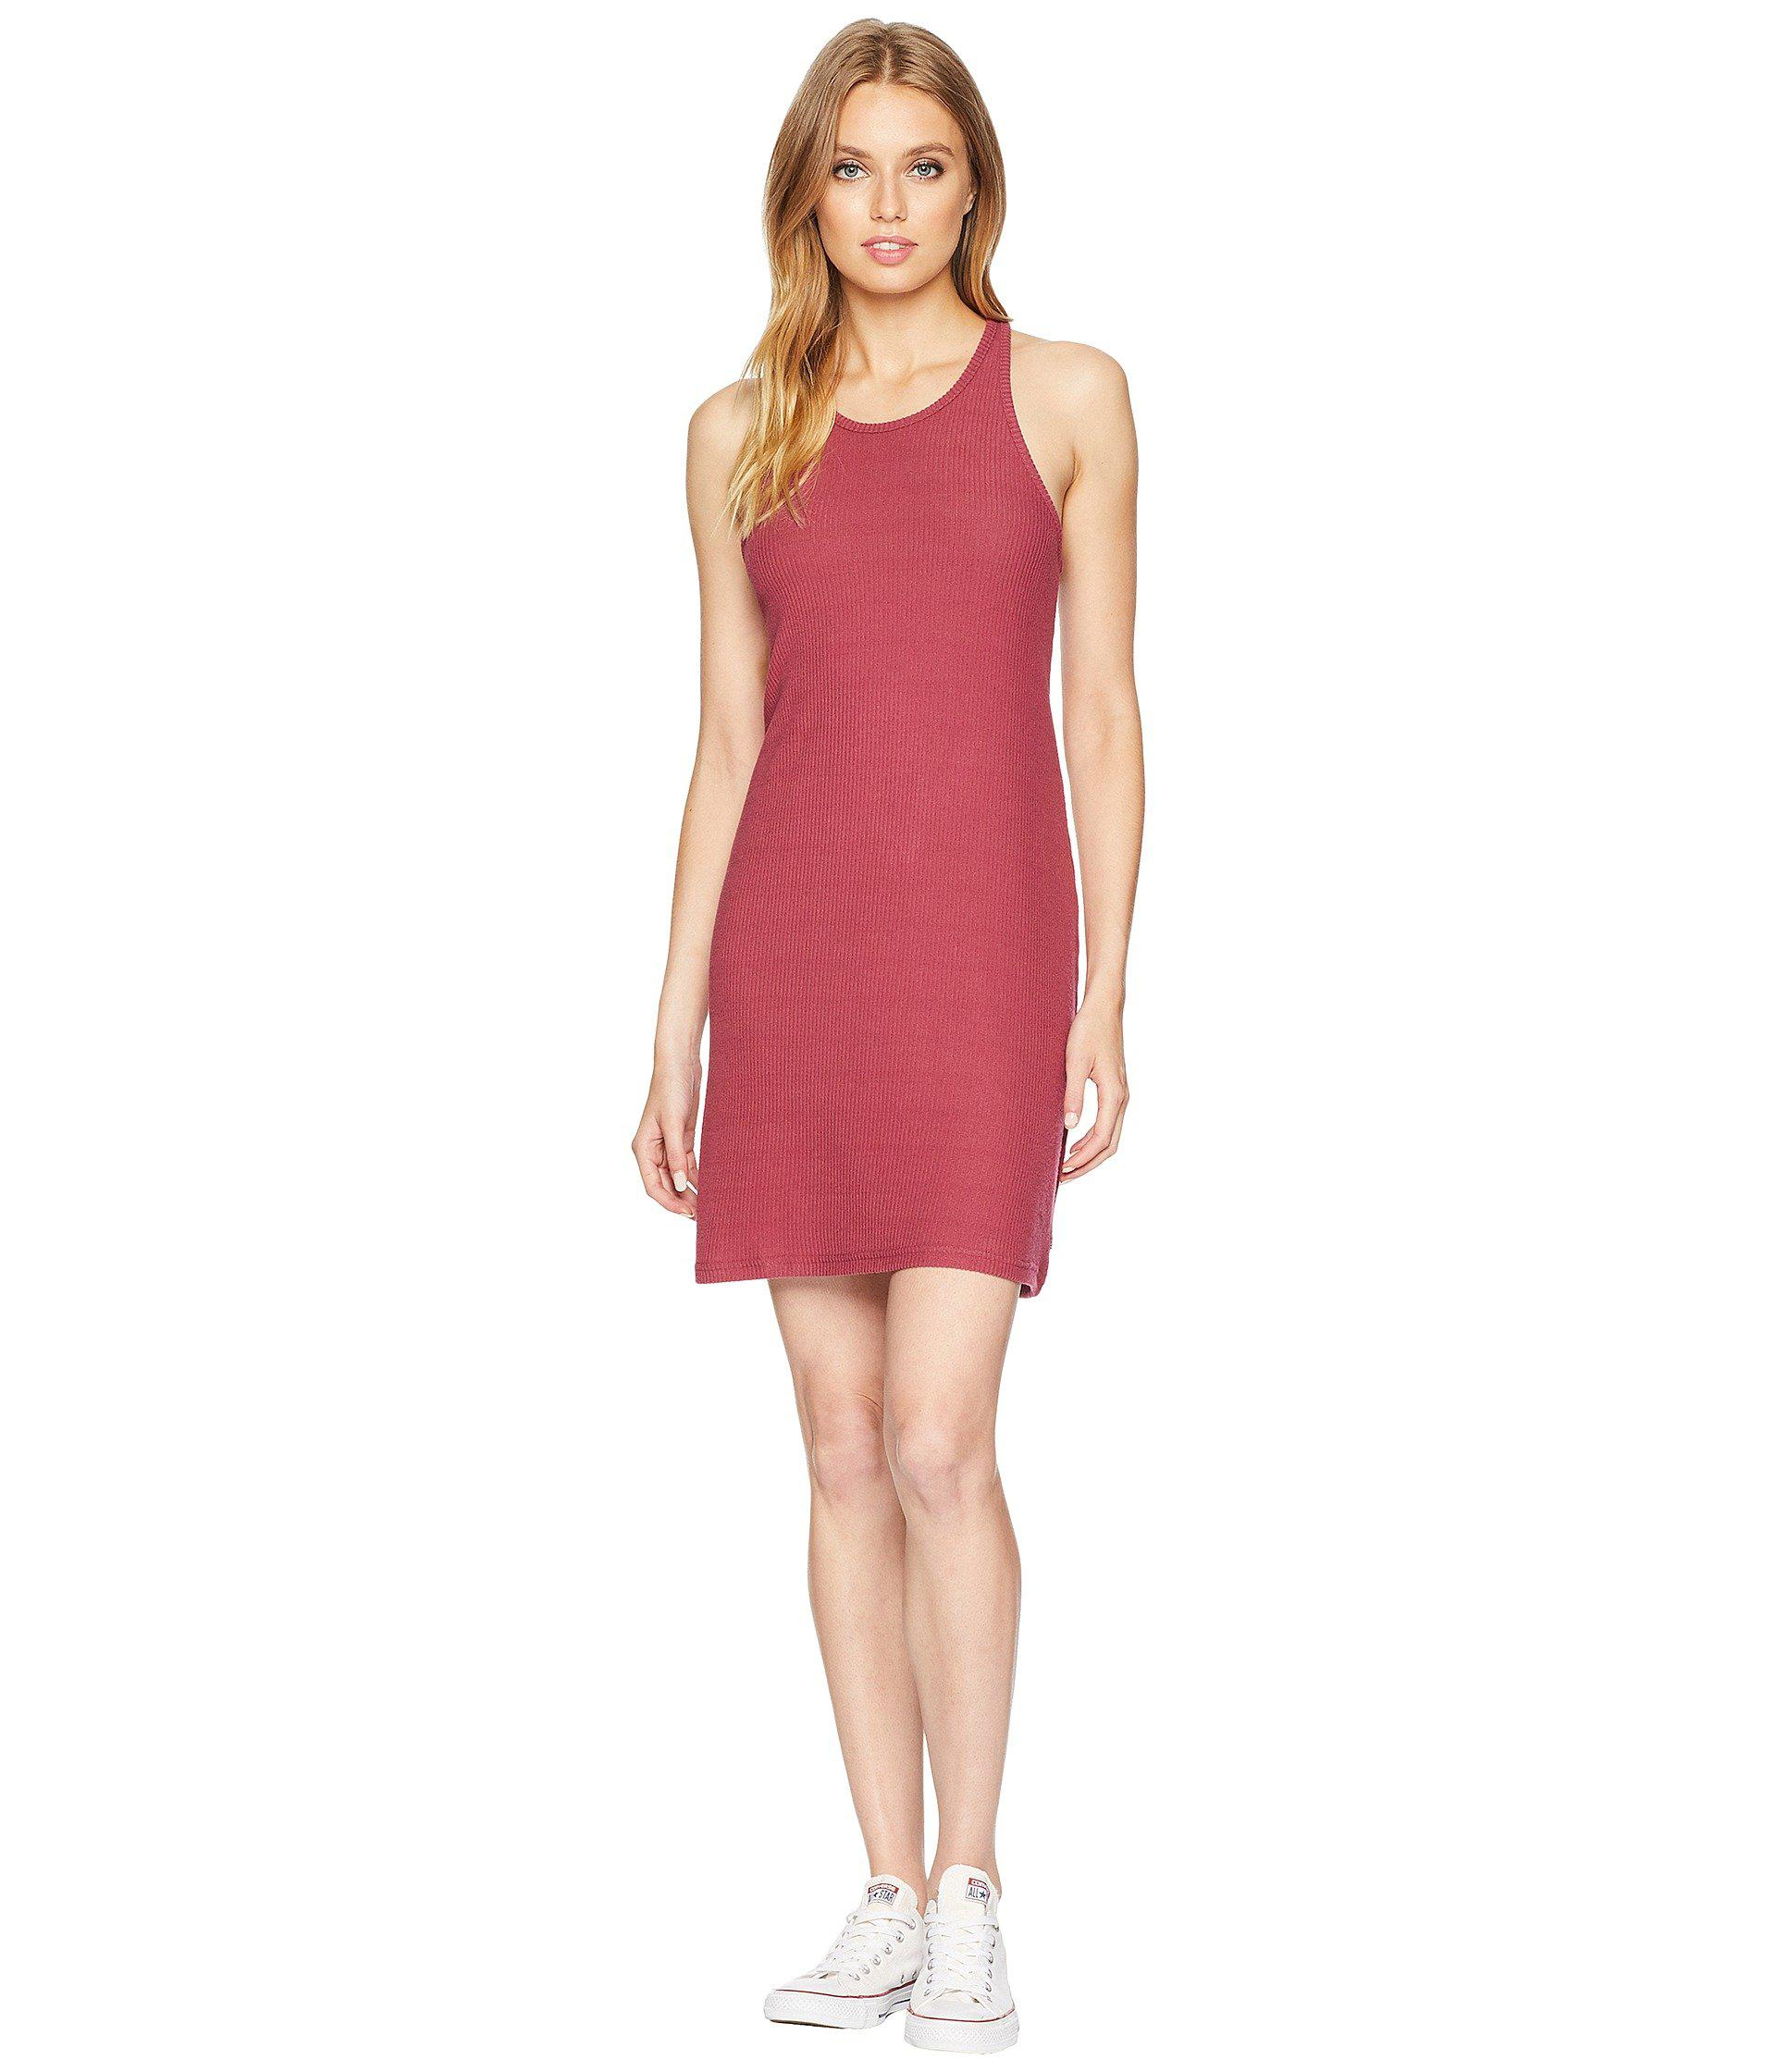 a07a3b5d626433 Lyst - Vans Alley Ii Dress in Red